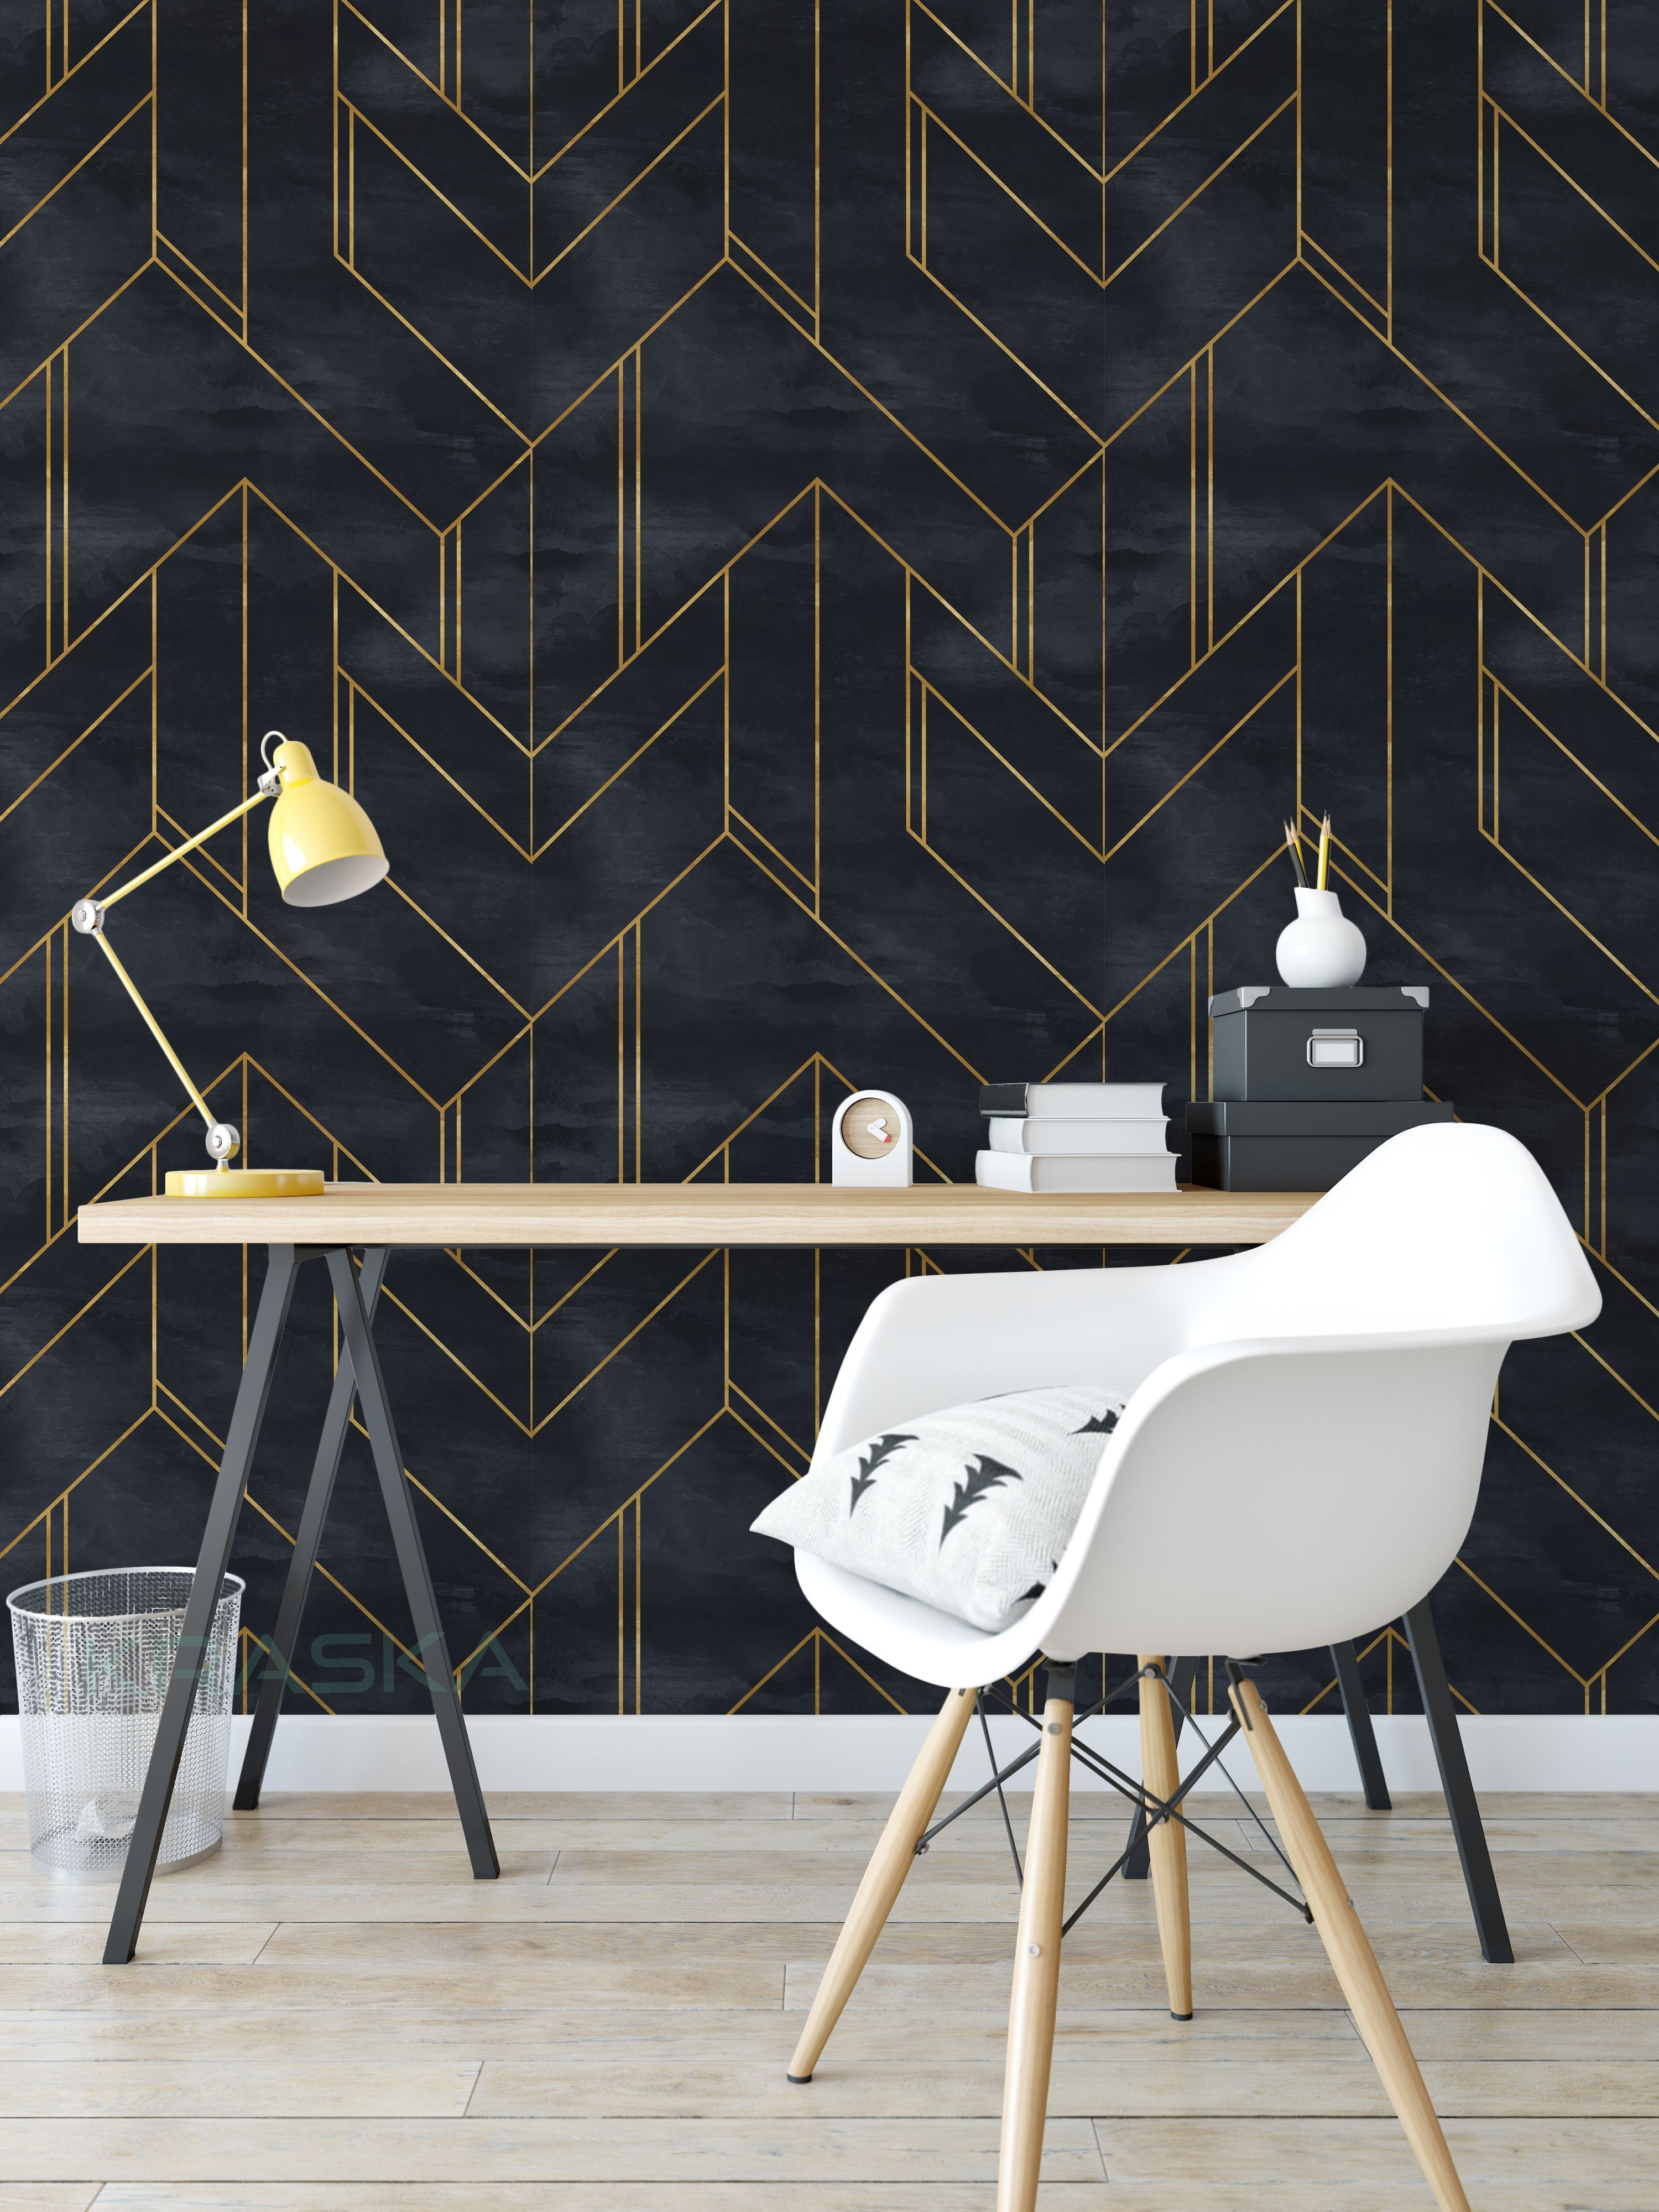 Wallpaper Rolls Sheets For Sale In Stock Ebay Accent Walls In Living Room Bedroom Wallpaper Accent Wall Gold Wallpaper Bedroom